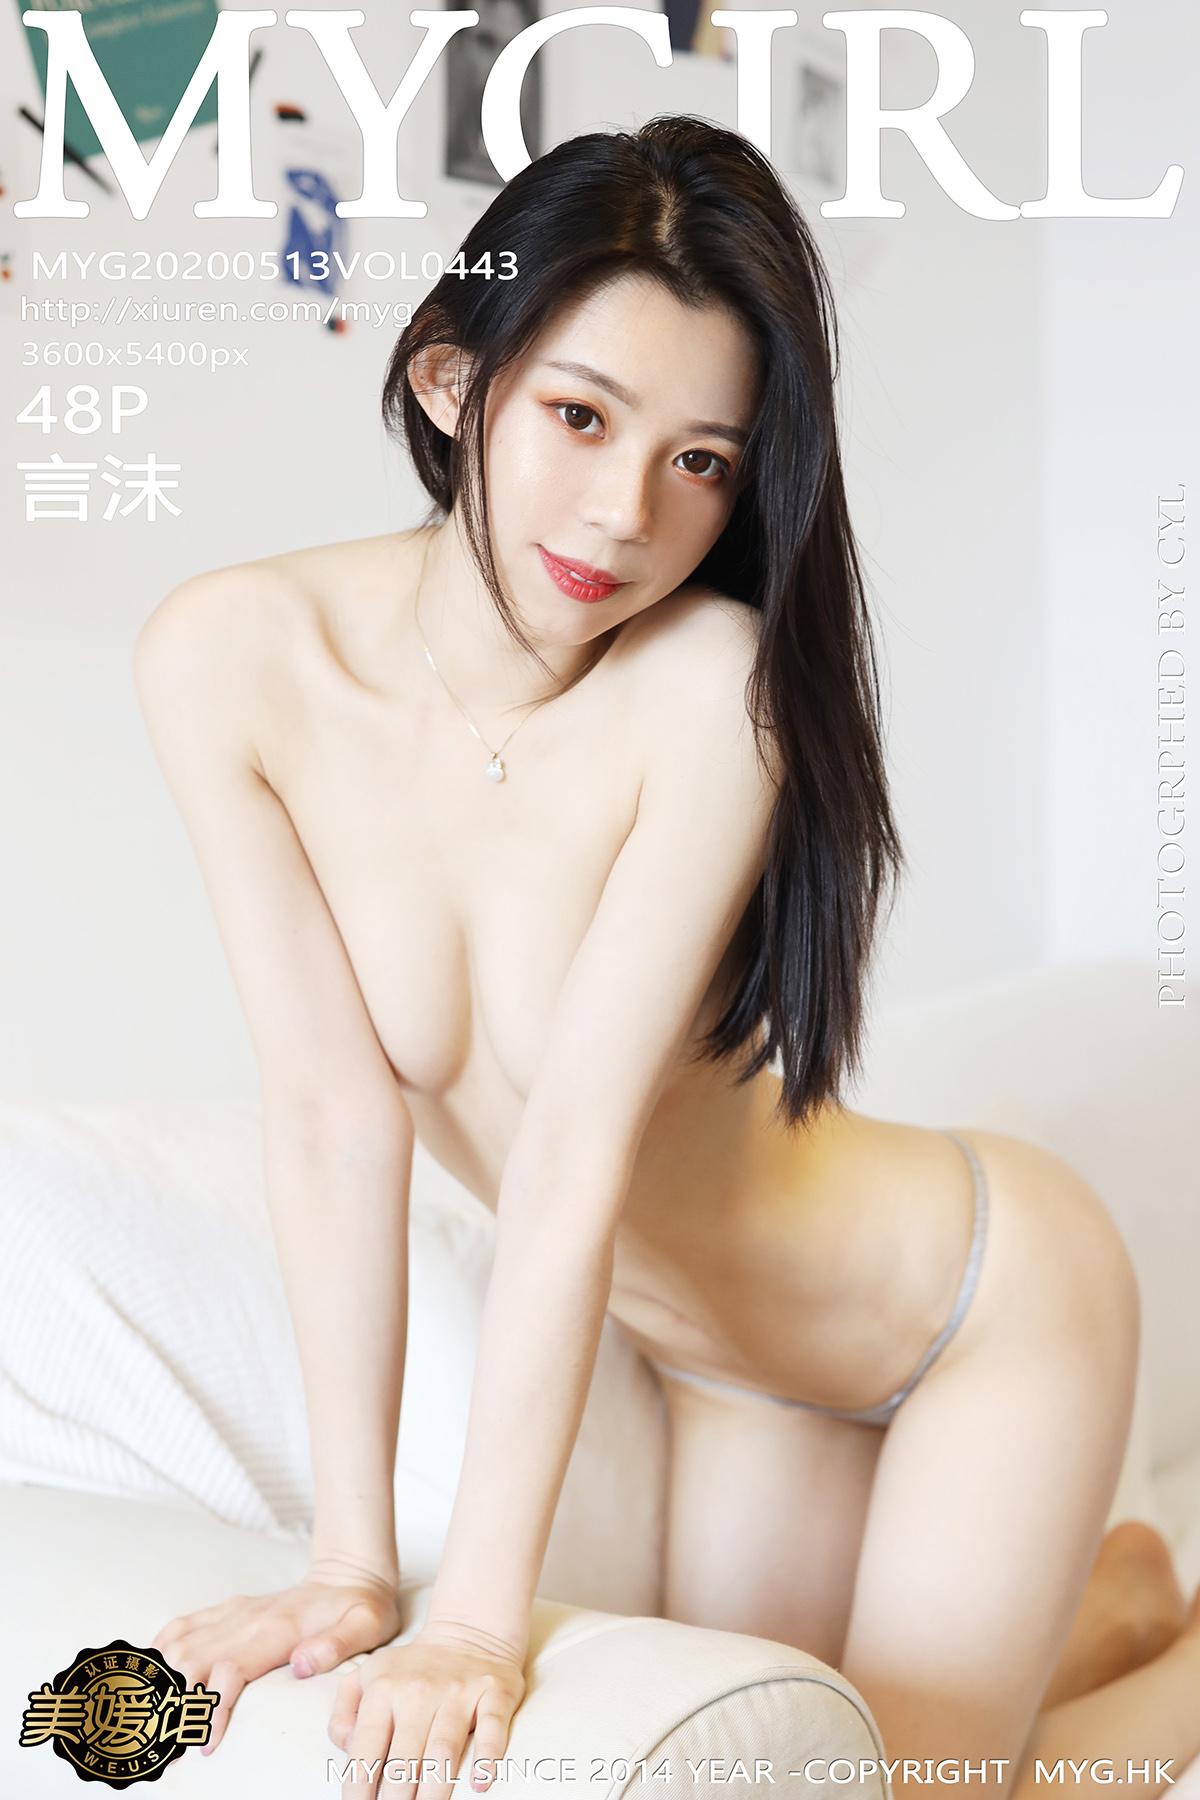 [MyGirl美媛馆]2020.05.13 VOL.443 雪白肌肤娇柔欲滴 言沫[/82MB]